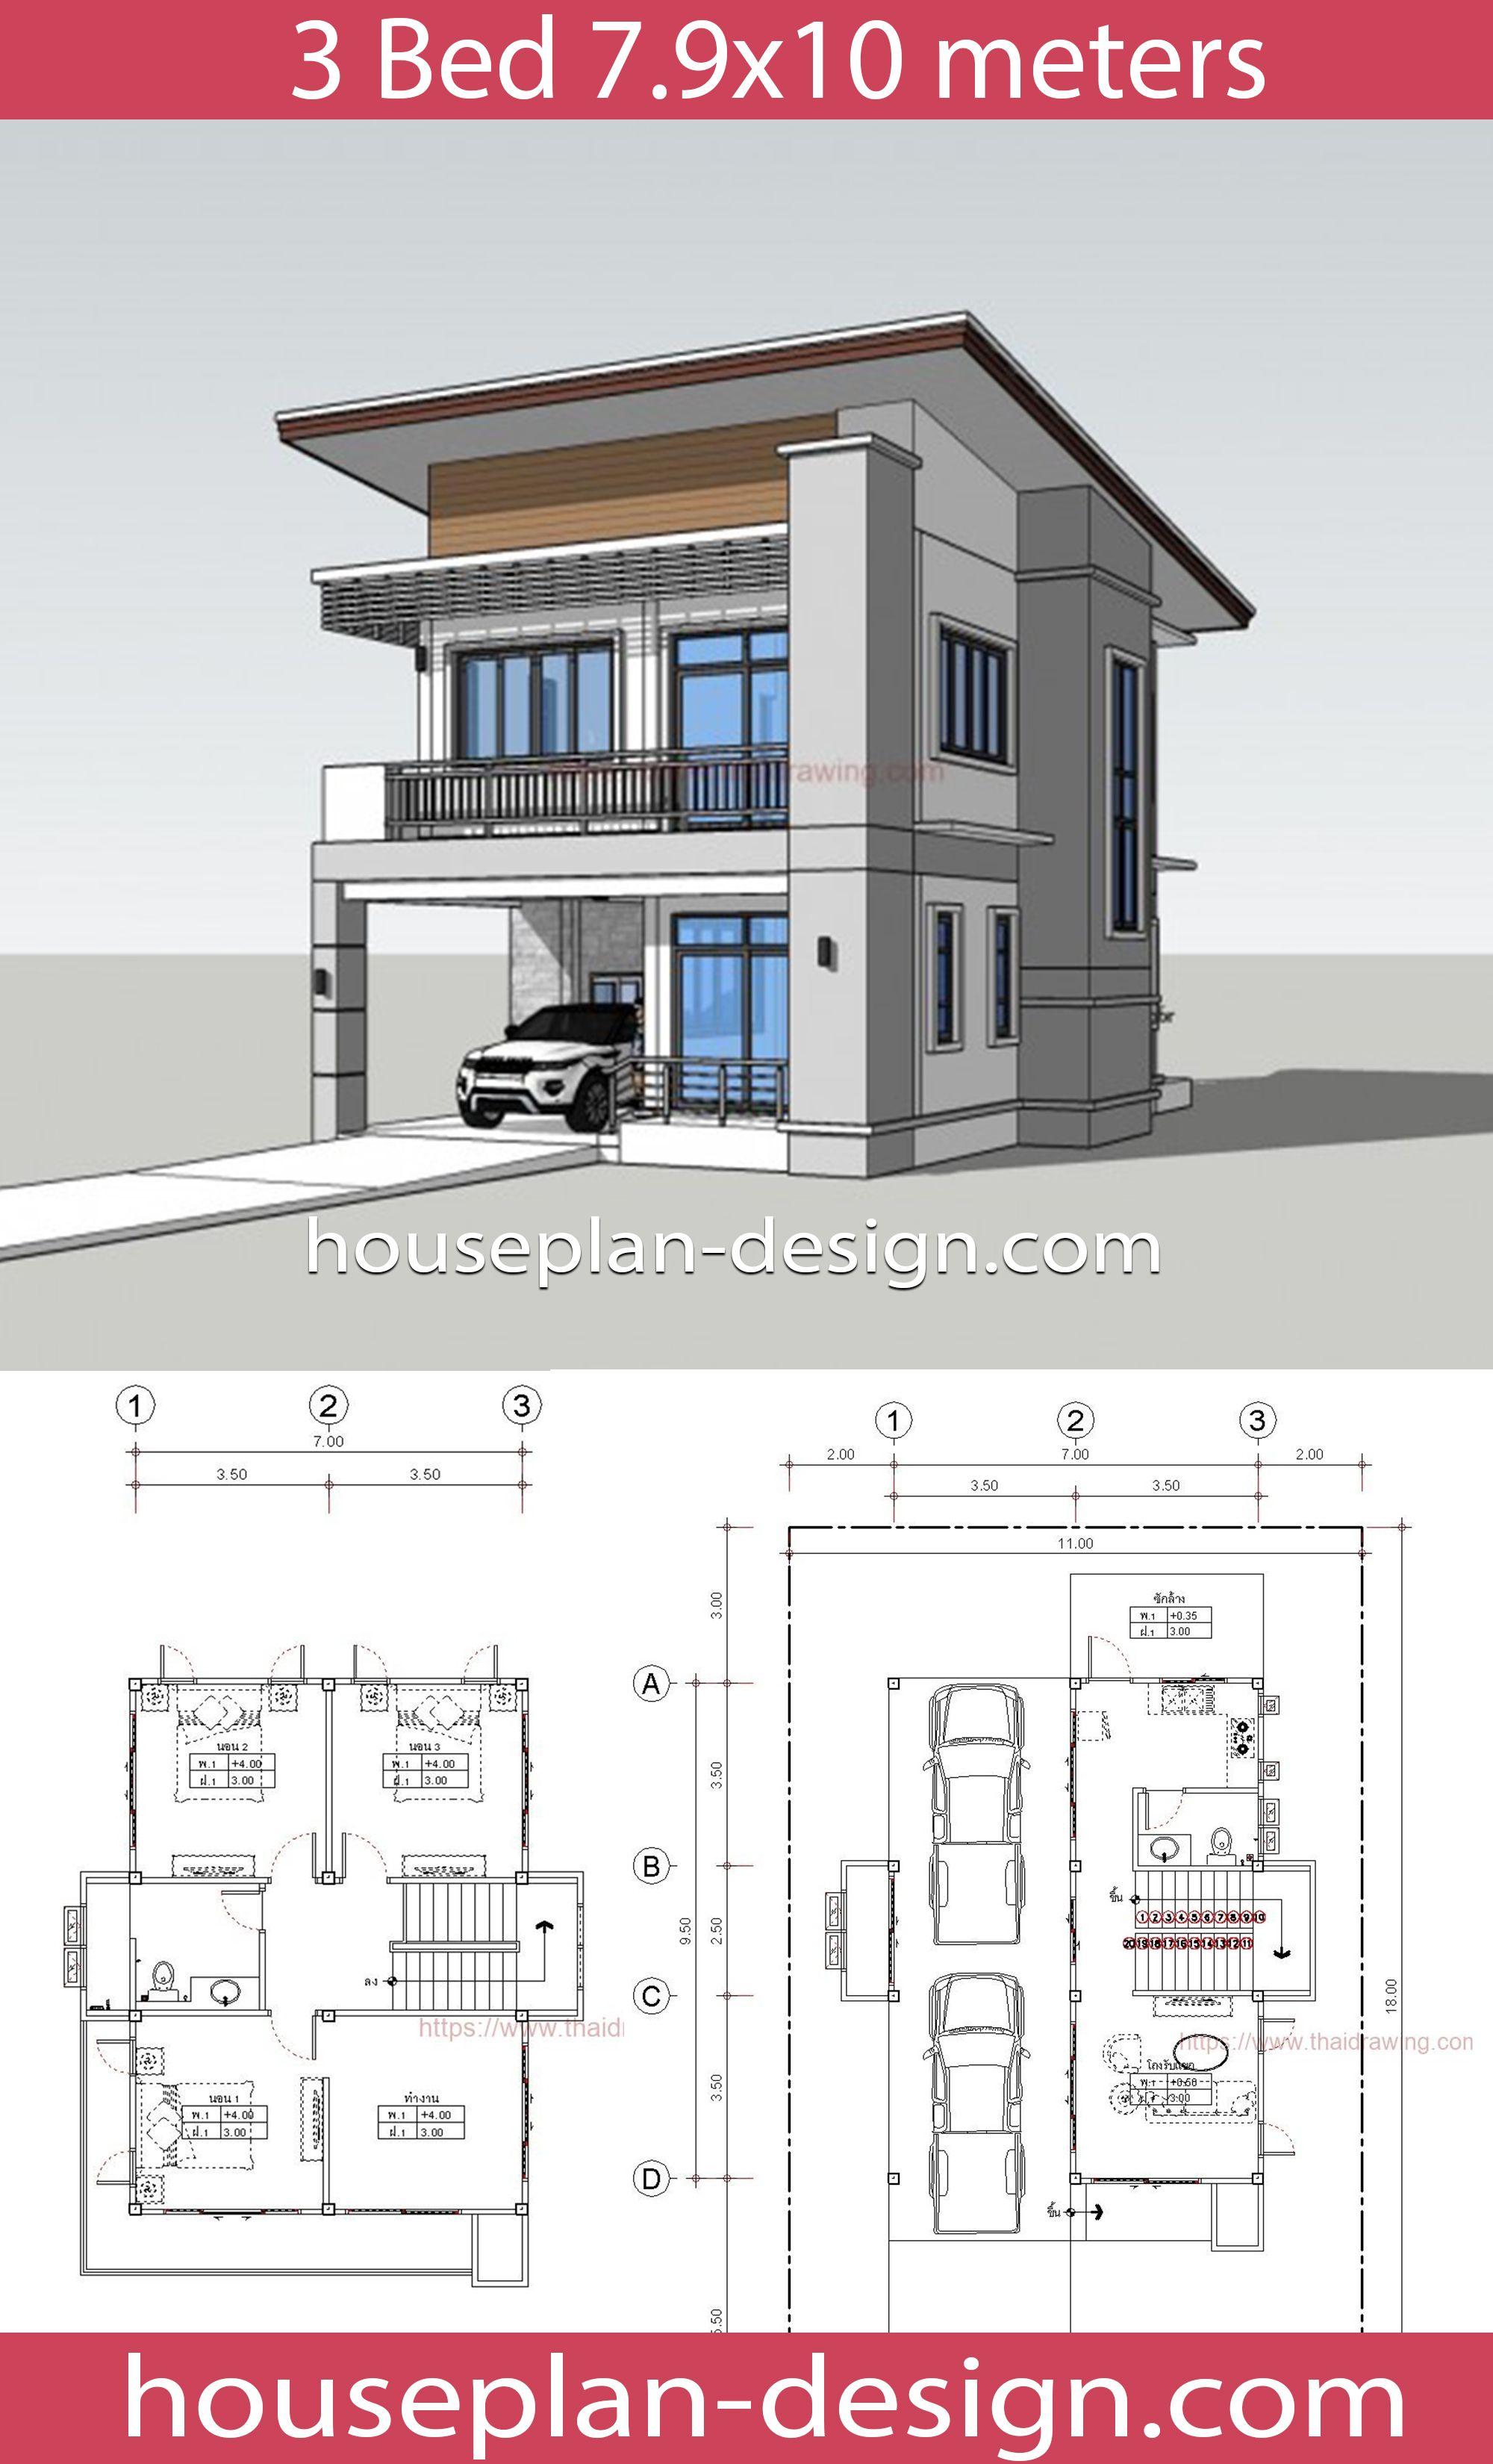 House Plan Design House Design Idea 7 9x10 With 3 Bedrooms House Design Unique House Plans House Designs Exterior